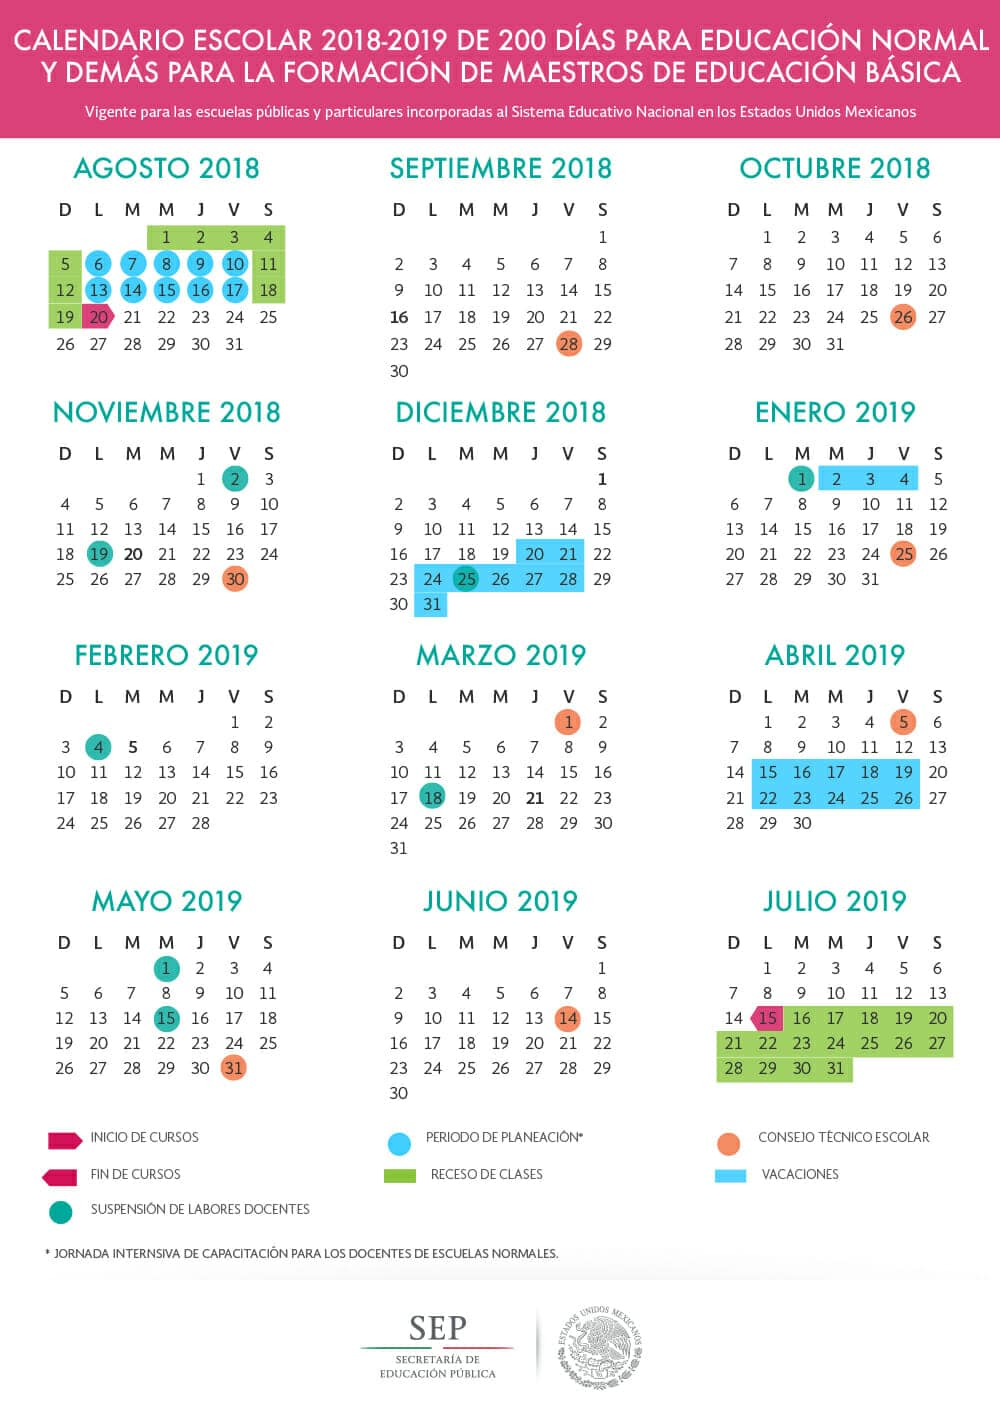 meses de invierno en calendario escolar